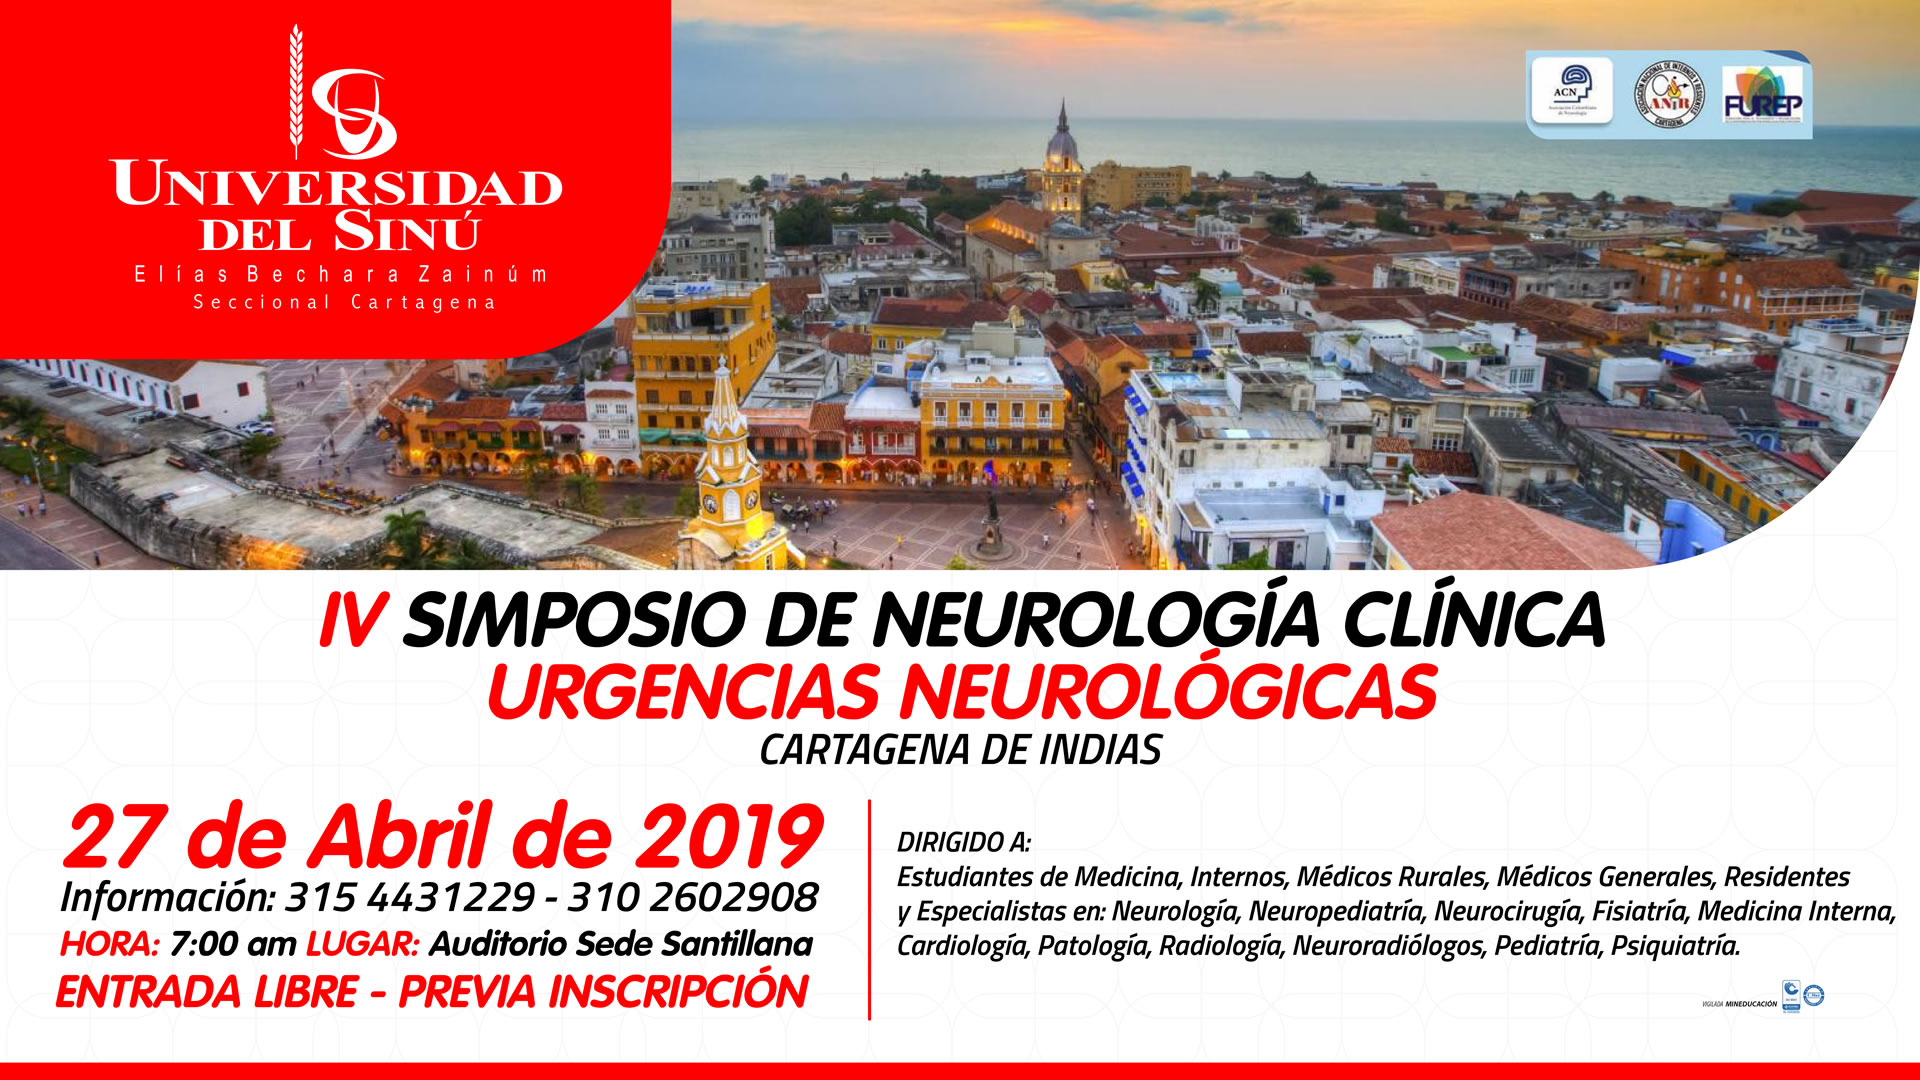 IV SIMPOSIO DE NEUROLOGIA CLINICA_Mesa de trabajo 2